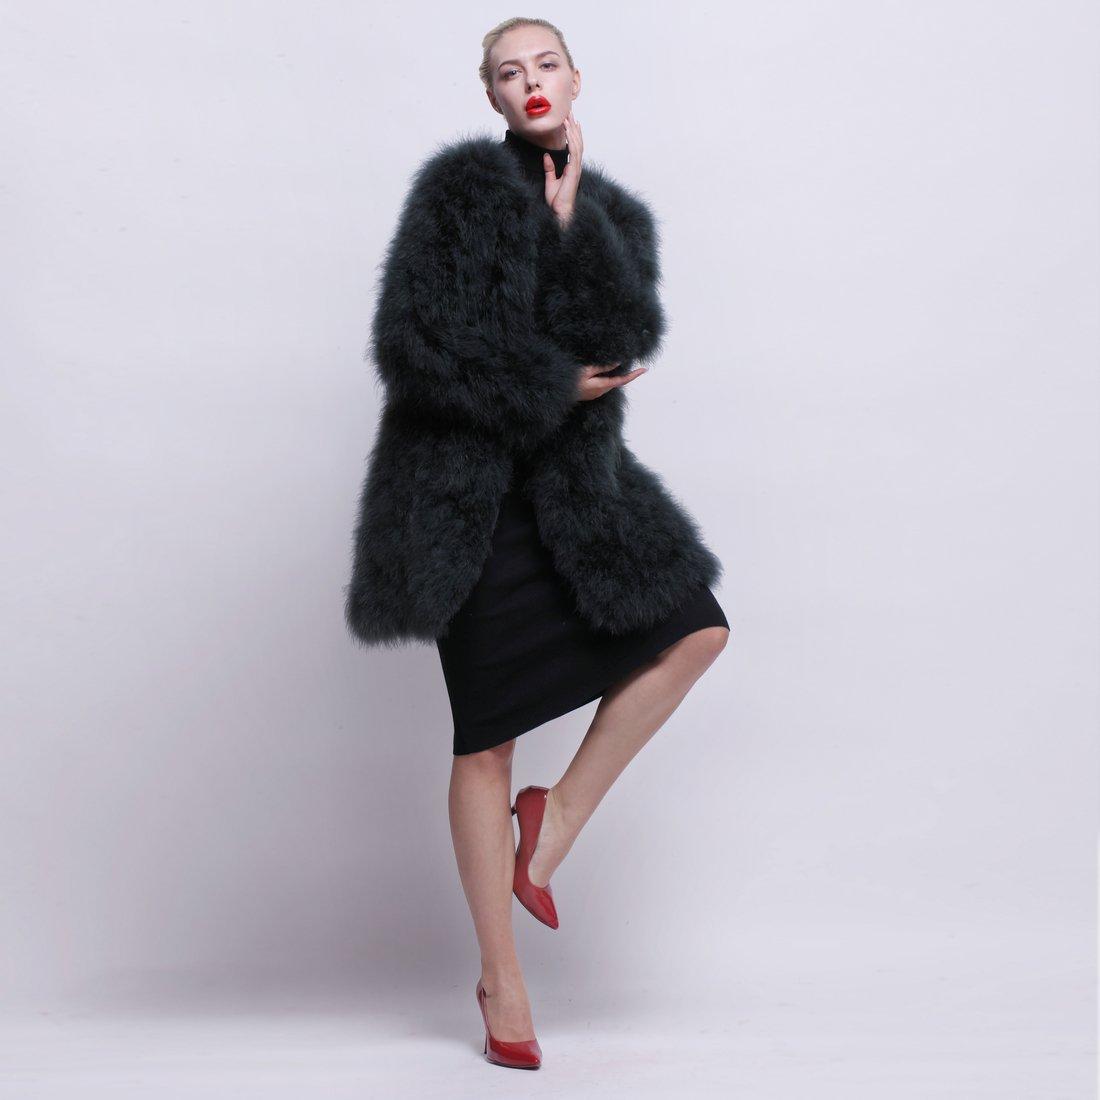 URSFUR Women Winter Jacket Real Ostrich Feather Fur Coat Opal Green XL by URSFUR (Image #6)